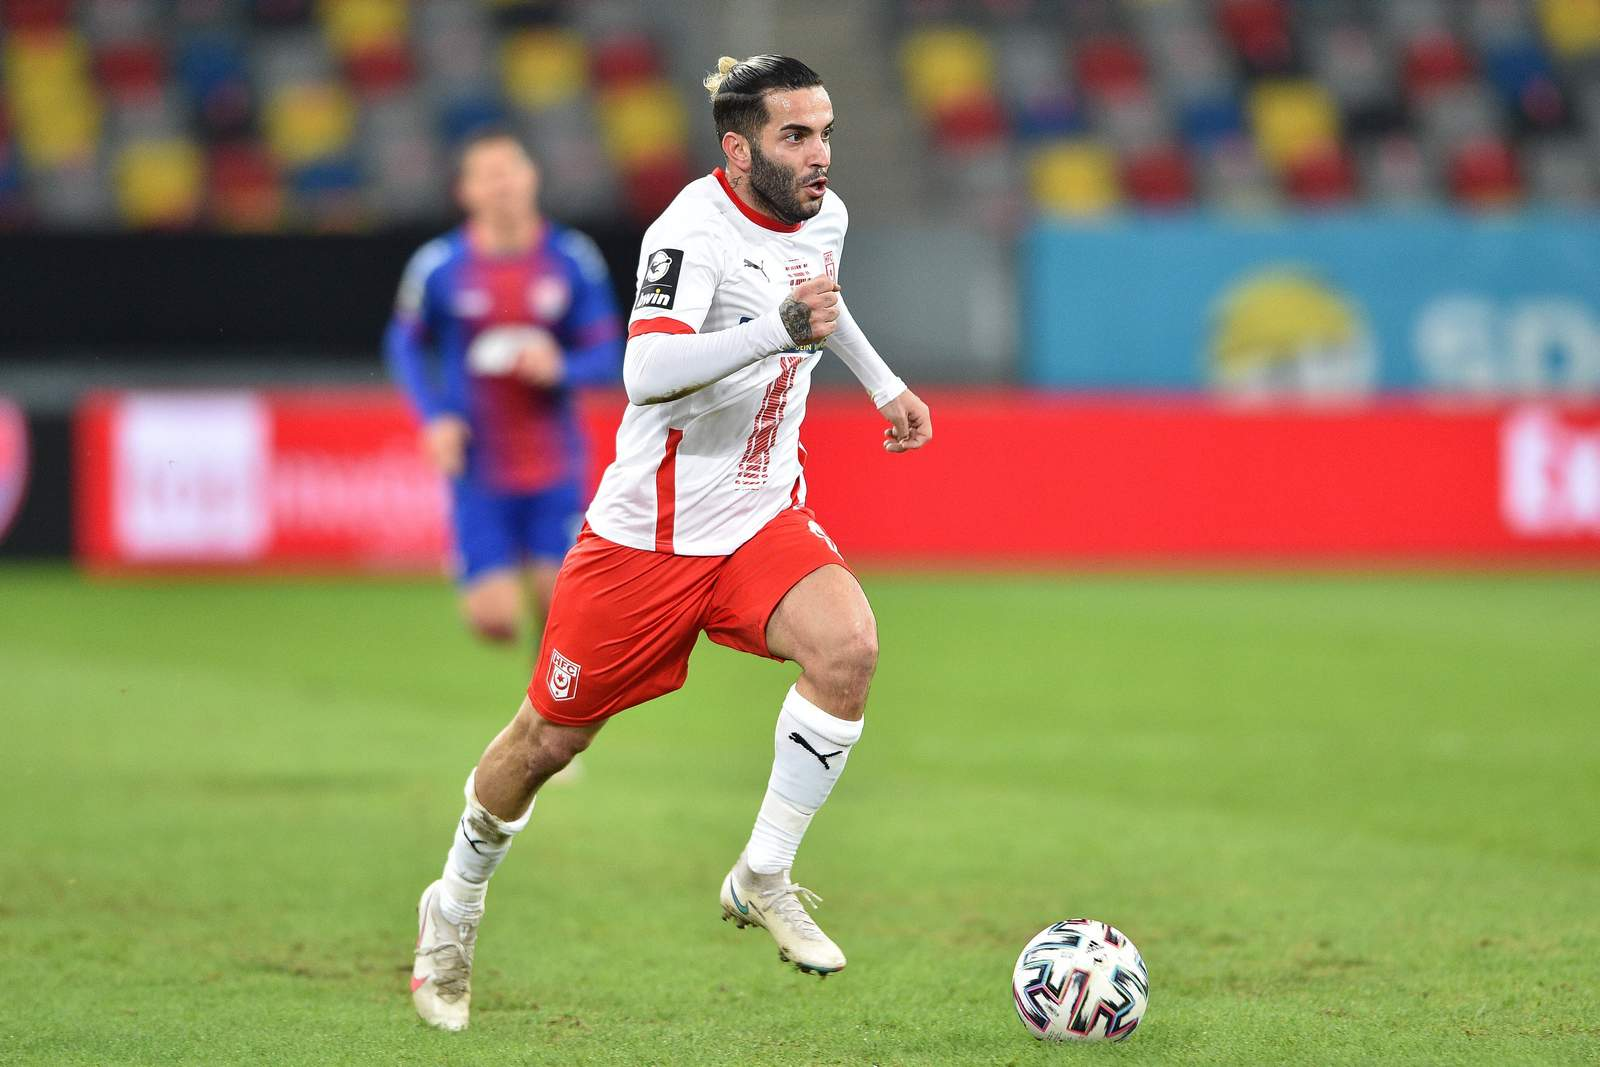 Selim Gündüz im Auswärtsspiel gegen Uerdingen.